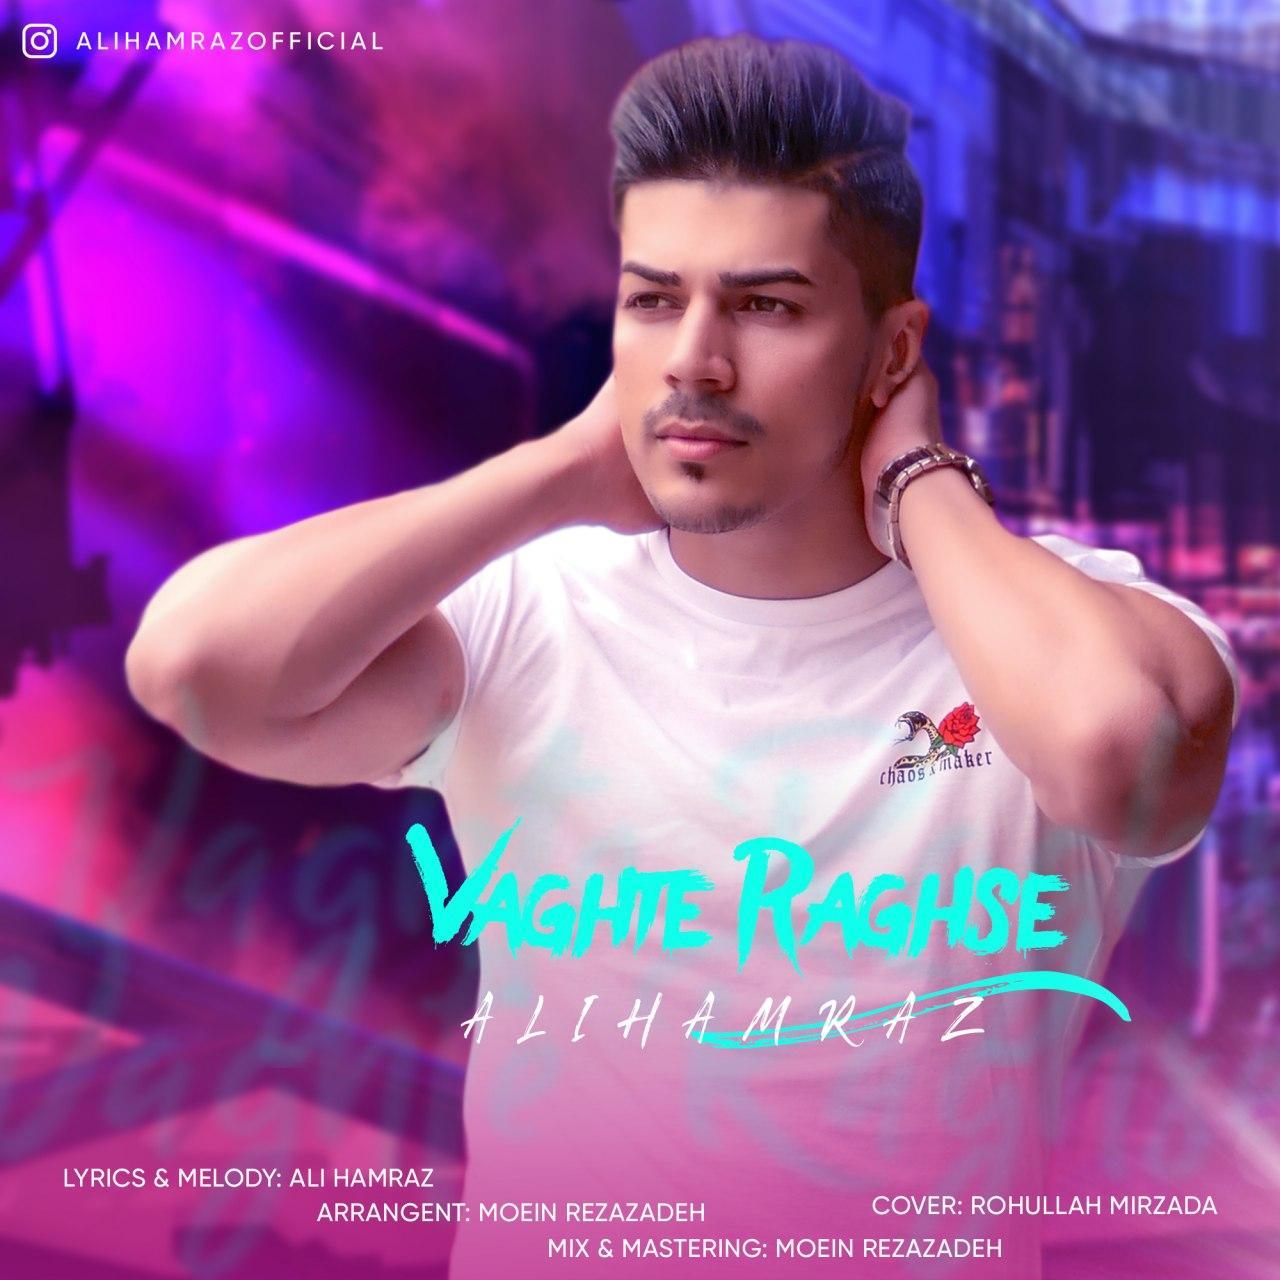 Ali Hamraz – Vaghte Raghse